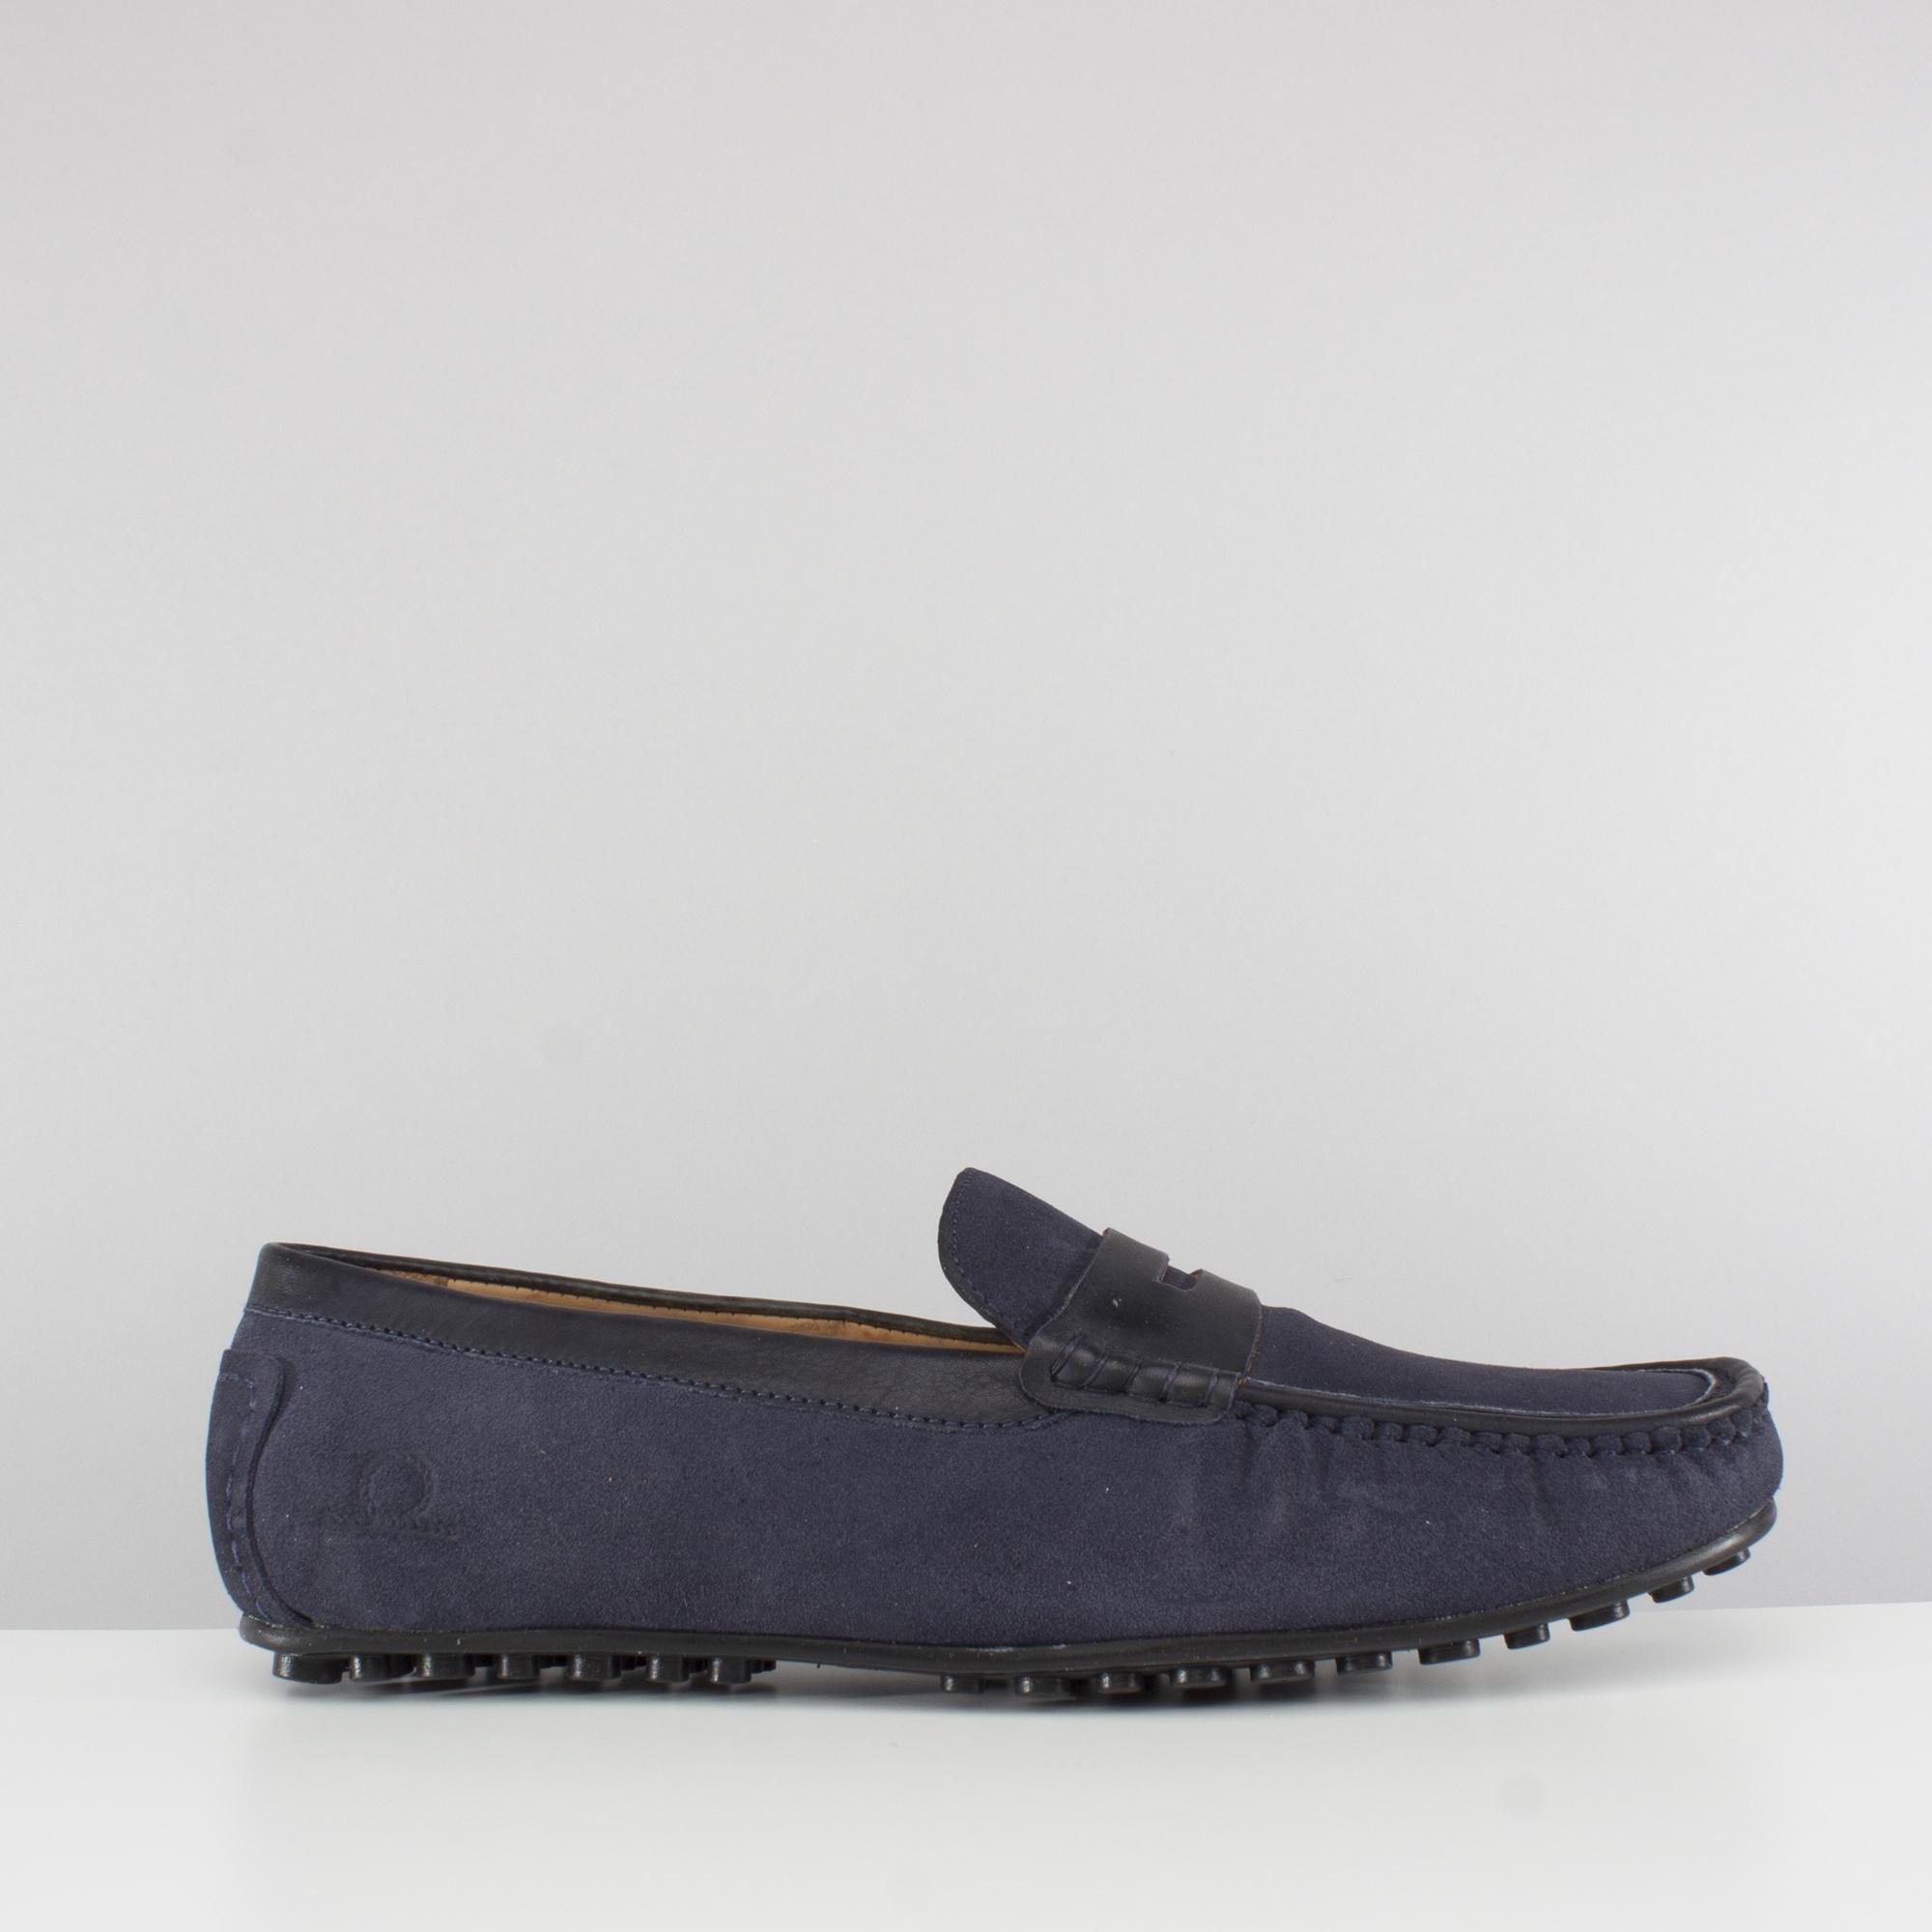 dd19ba0d3cfb7 Base London TOGA Mens Suede Moccasin Driving Shoes Navy Blue | Shuperb